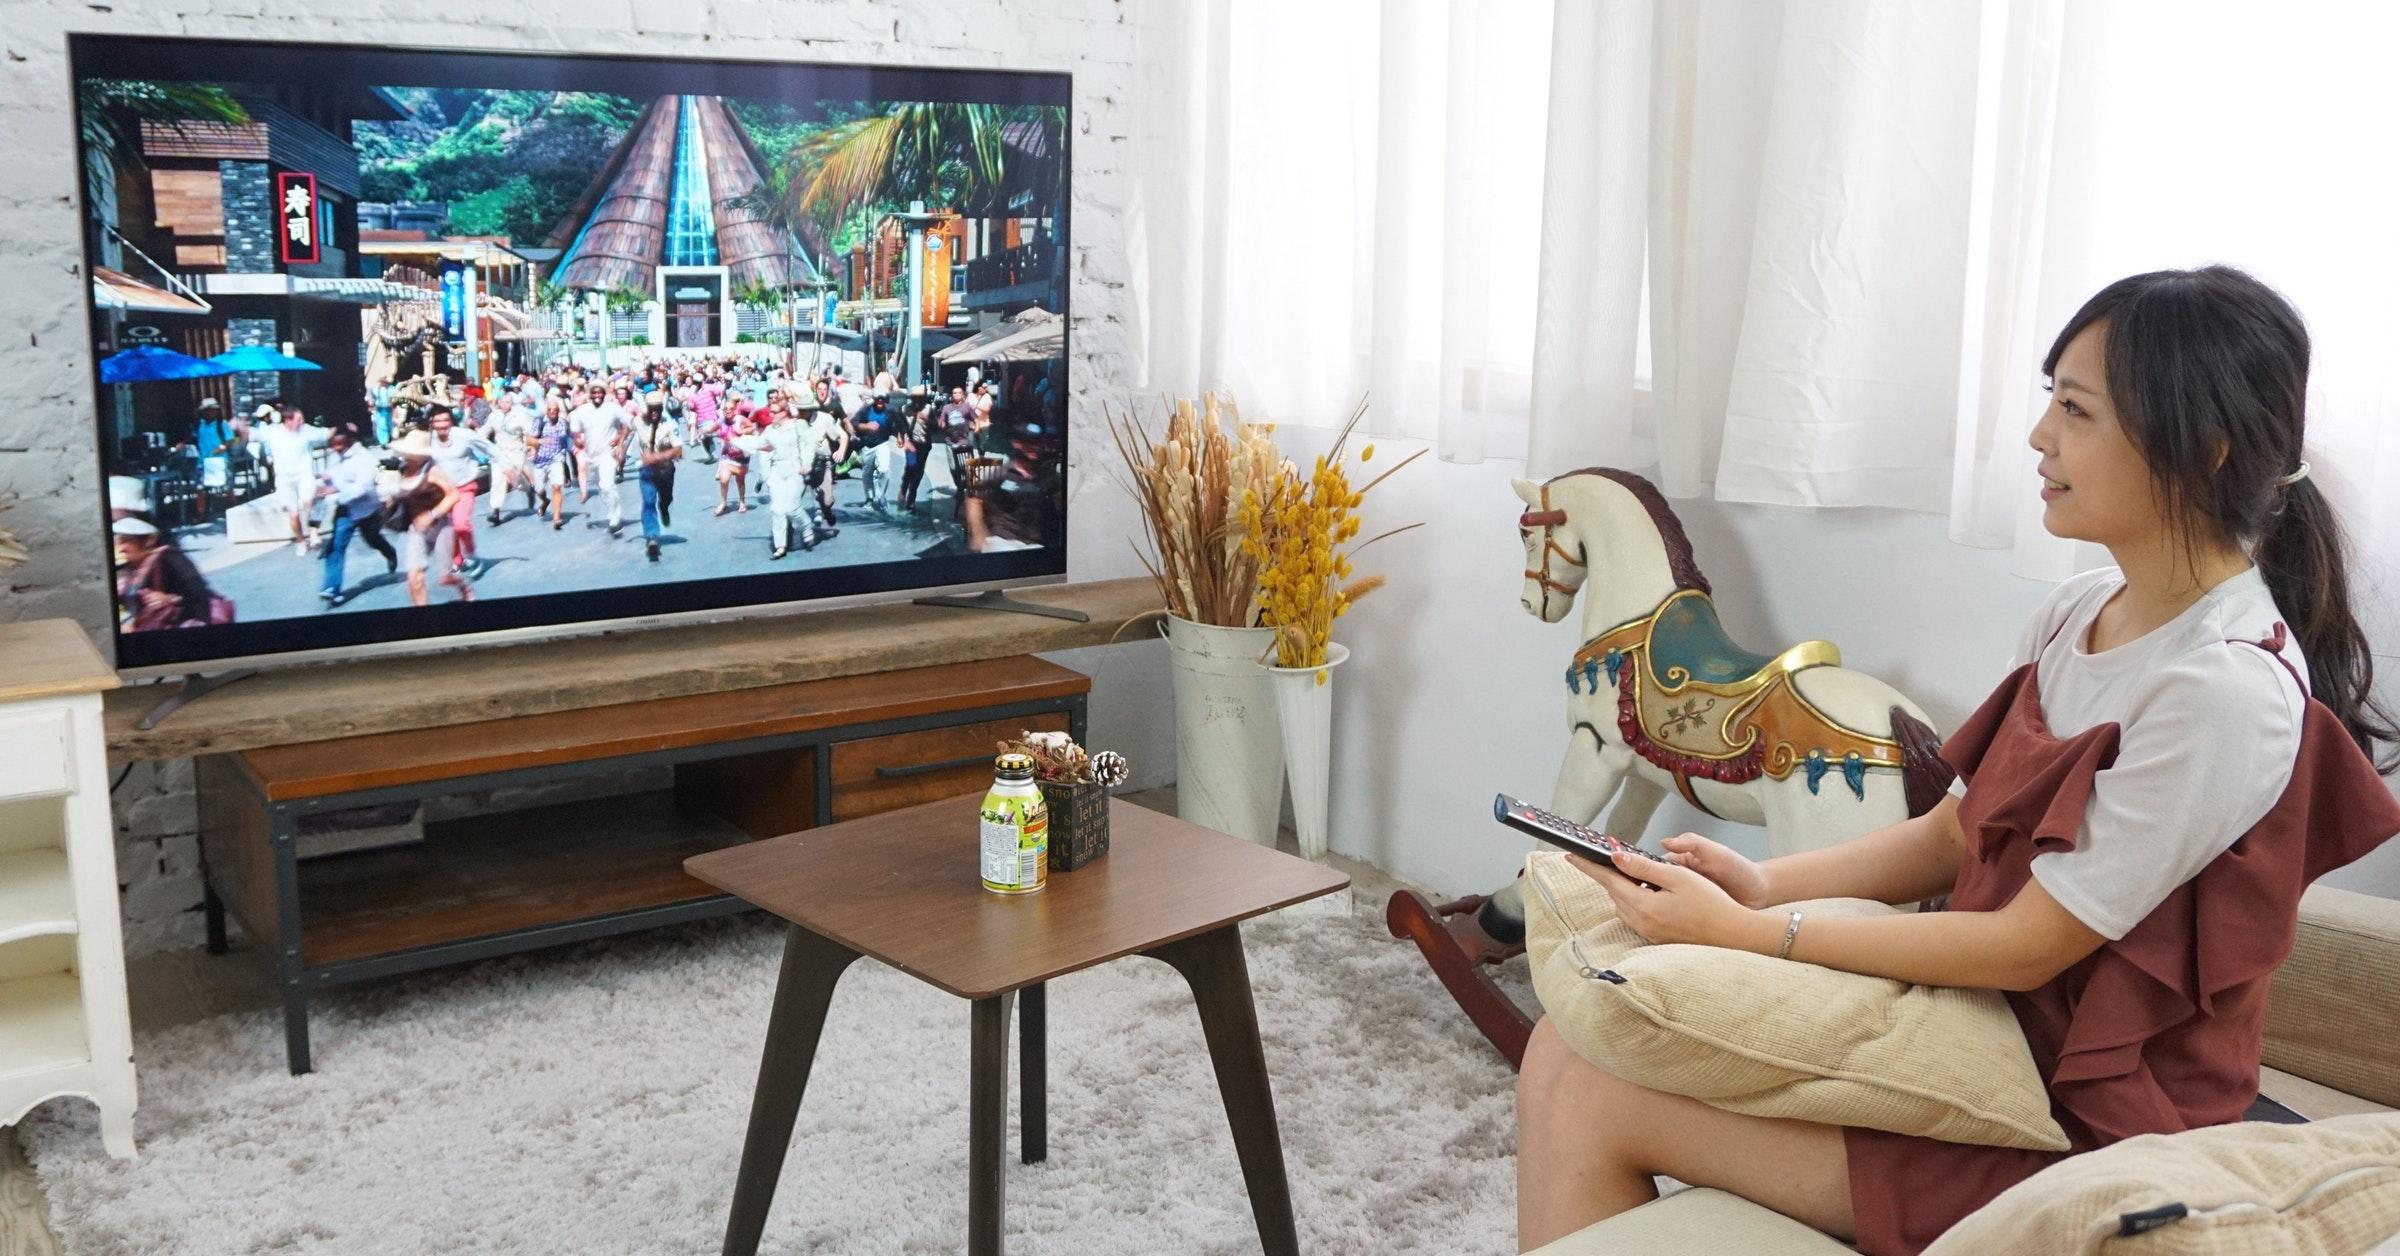 Television, Interior Design Services, Recreation, Design, room, room, furniture, table, television, media, recreation, interior design